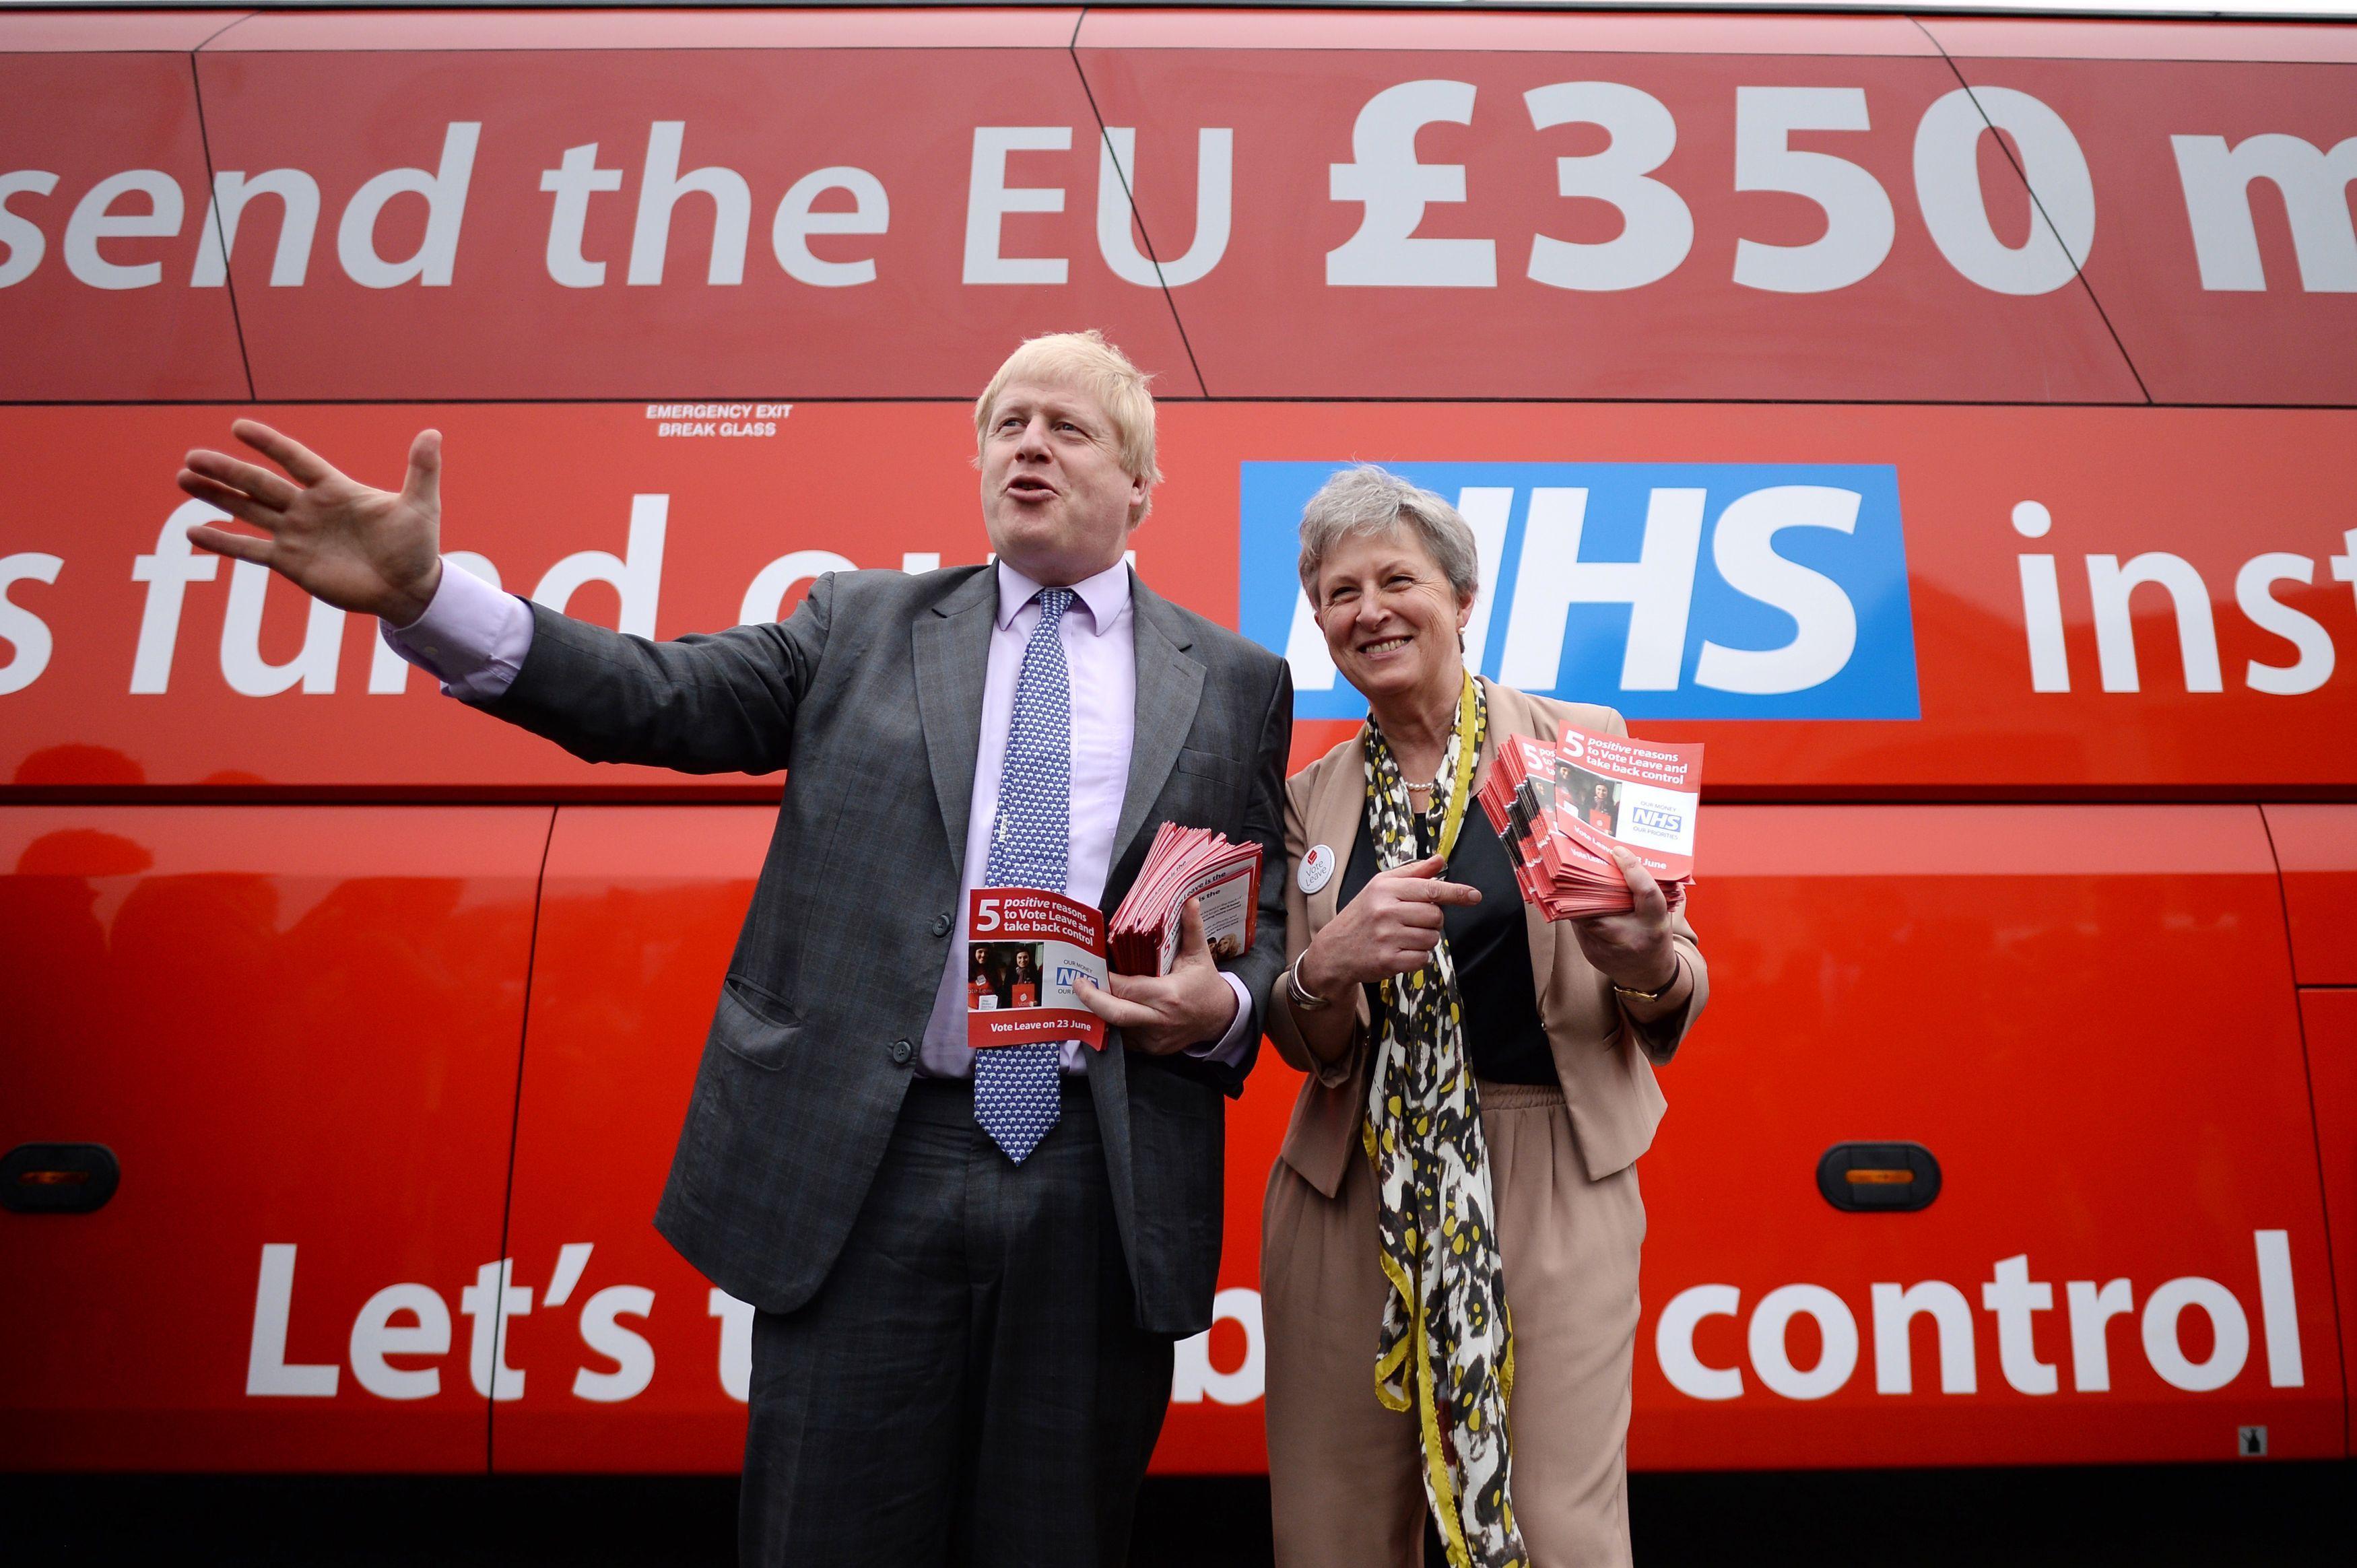 Boris Johnson £350m bus